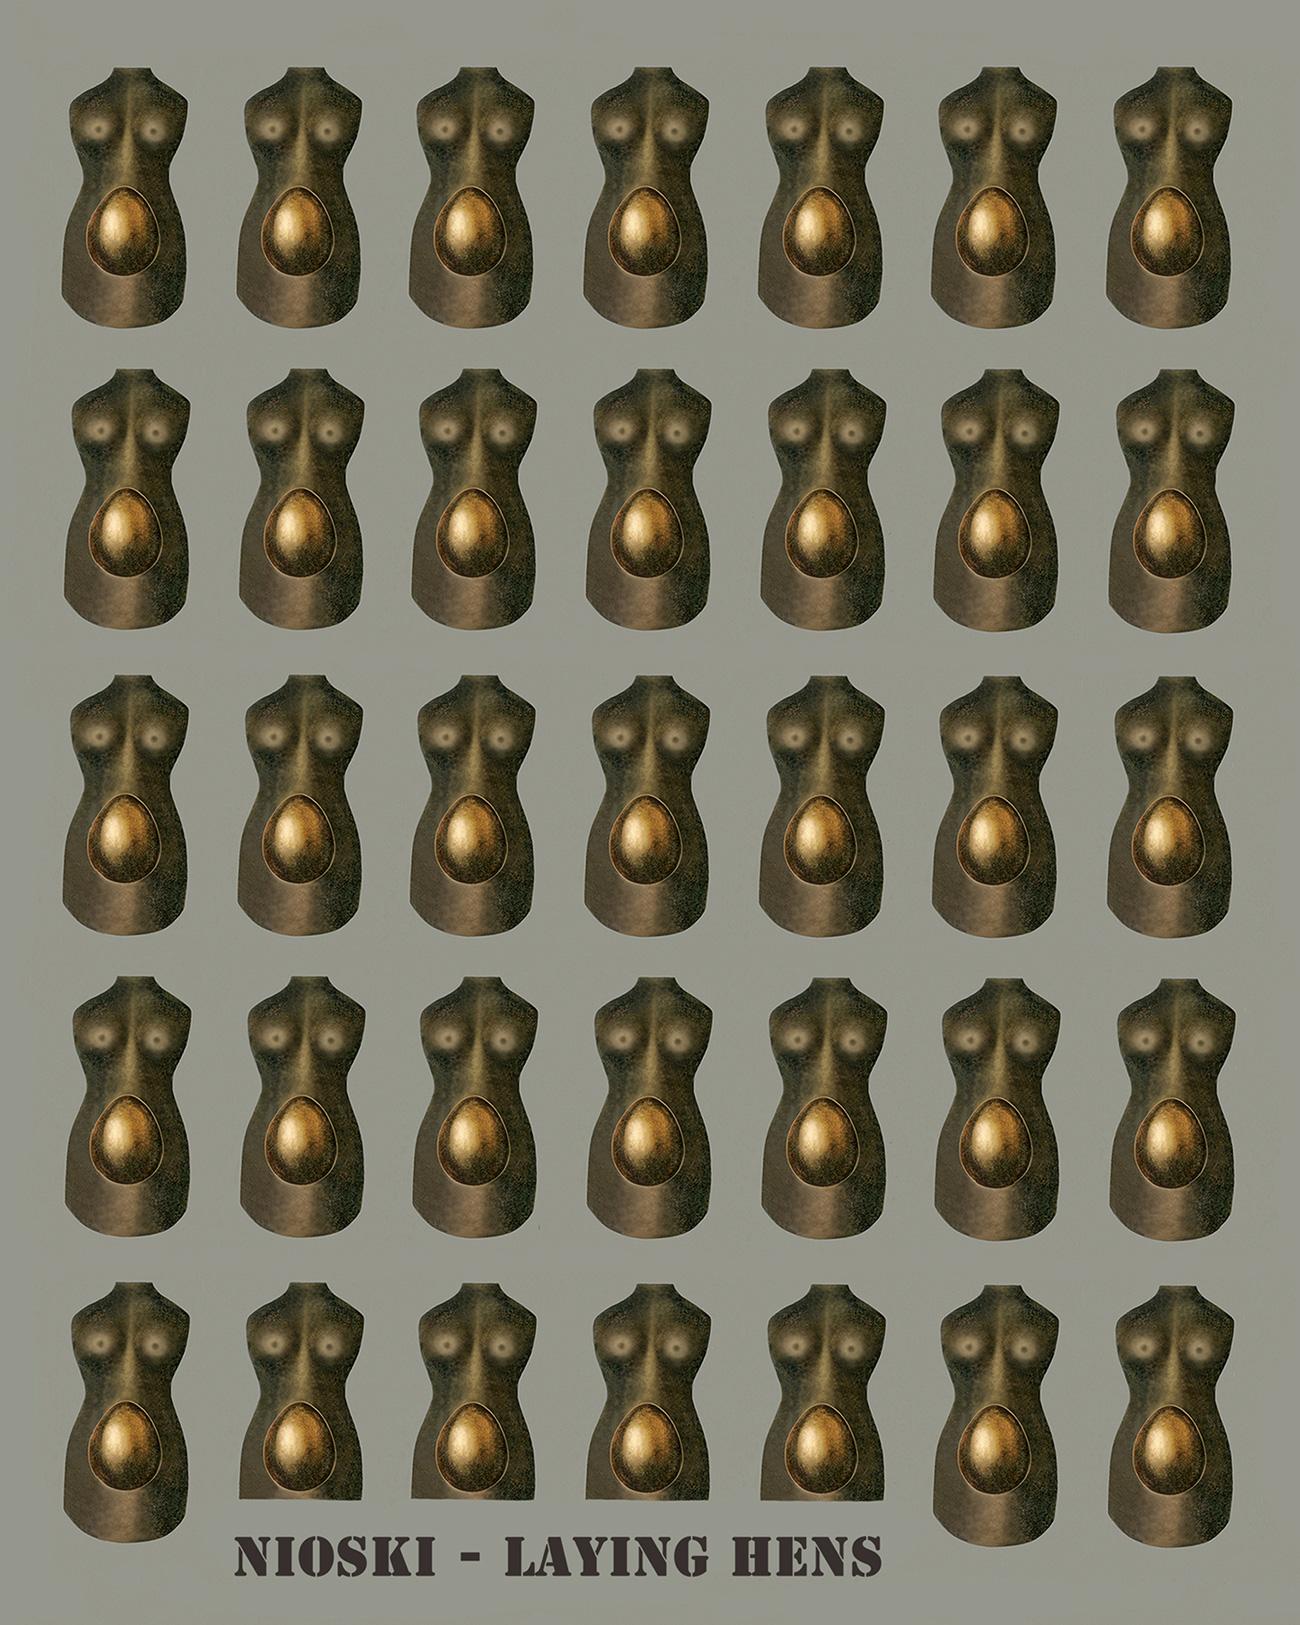 'Nioski – Laying Hens,' by Palm Coast artist Krystyna Spisak-Madejczyk. (Krystyna Spisak-Madejczyk)